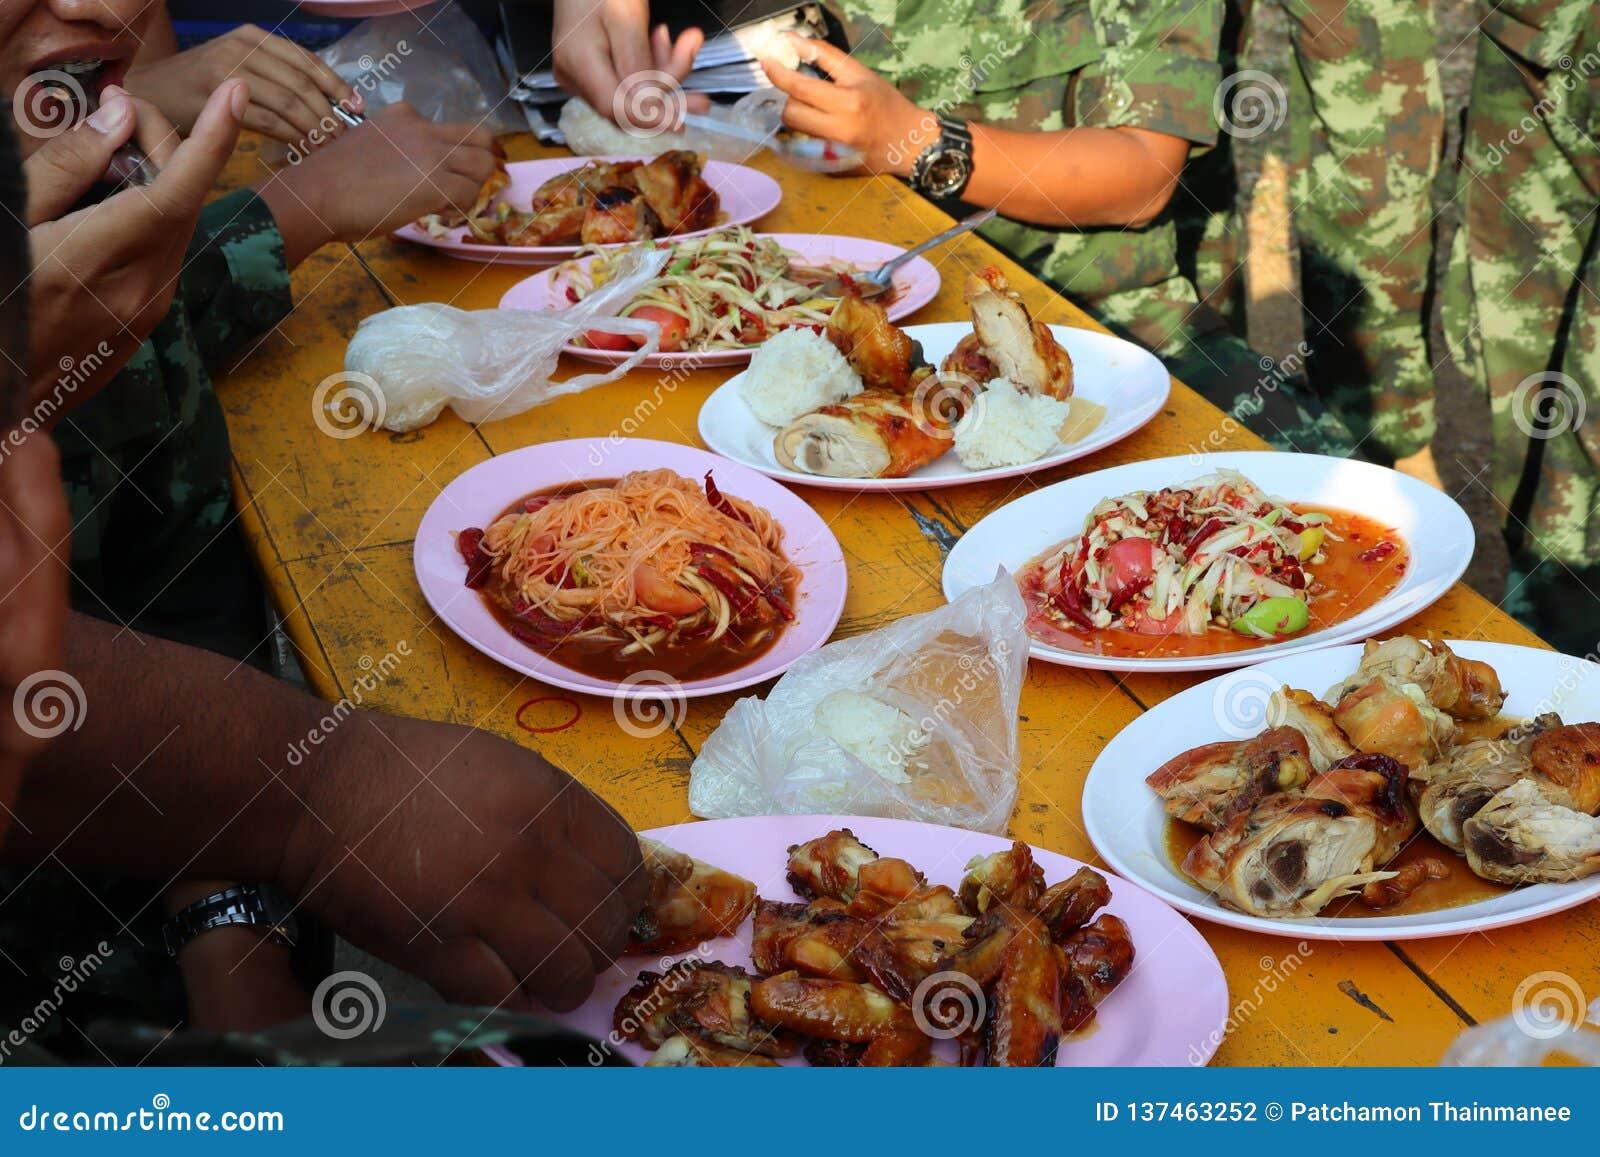 Thai food, papaya salad, grilled chicken in a vintage style restaurant, street food